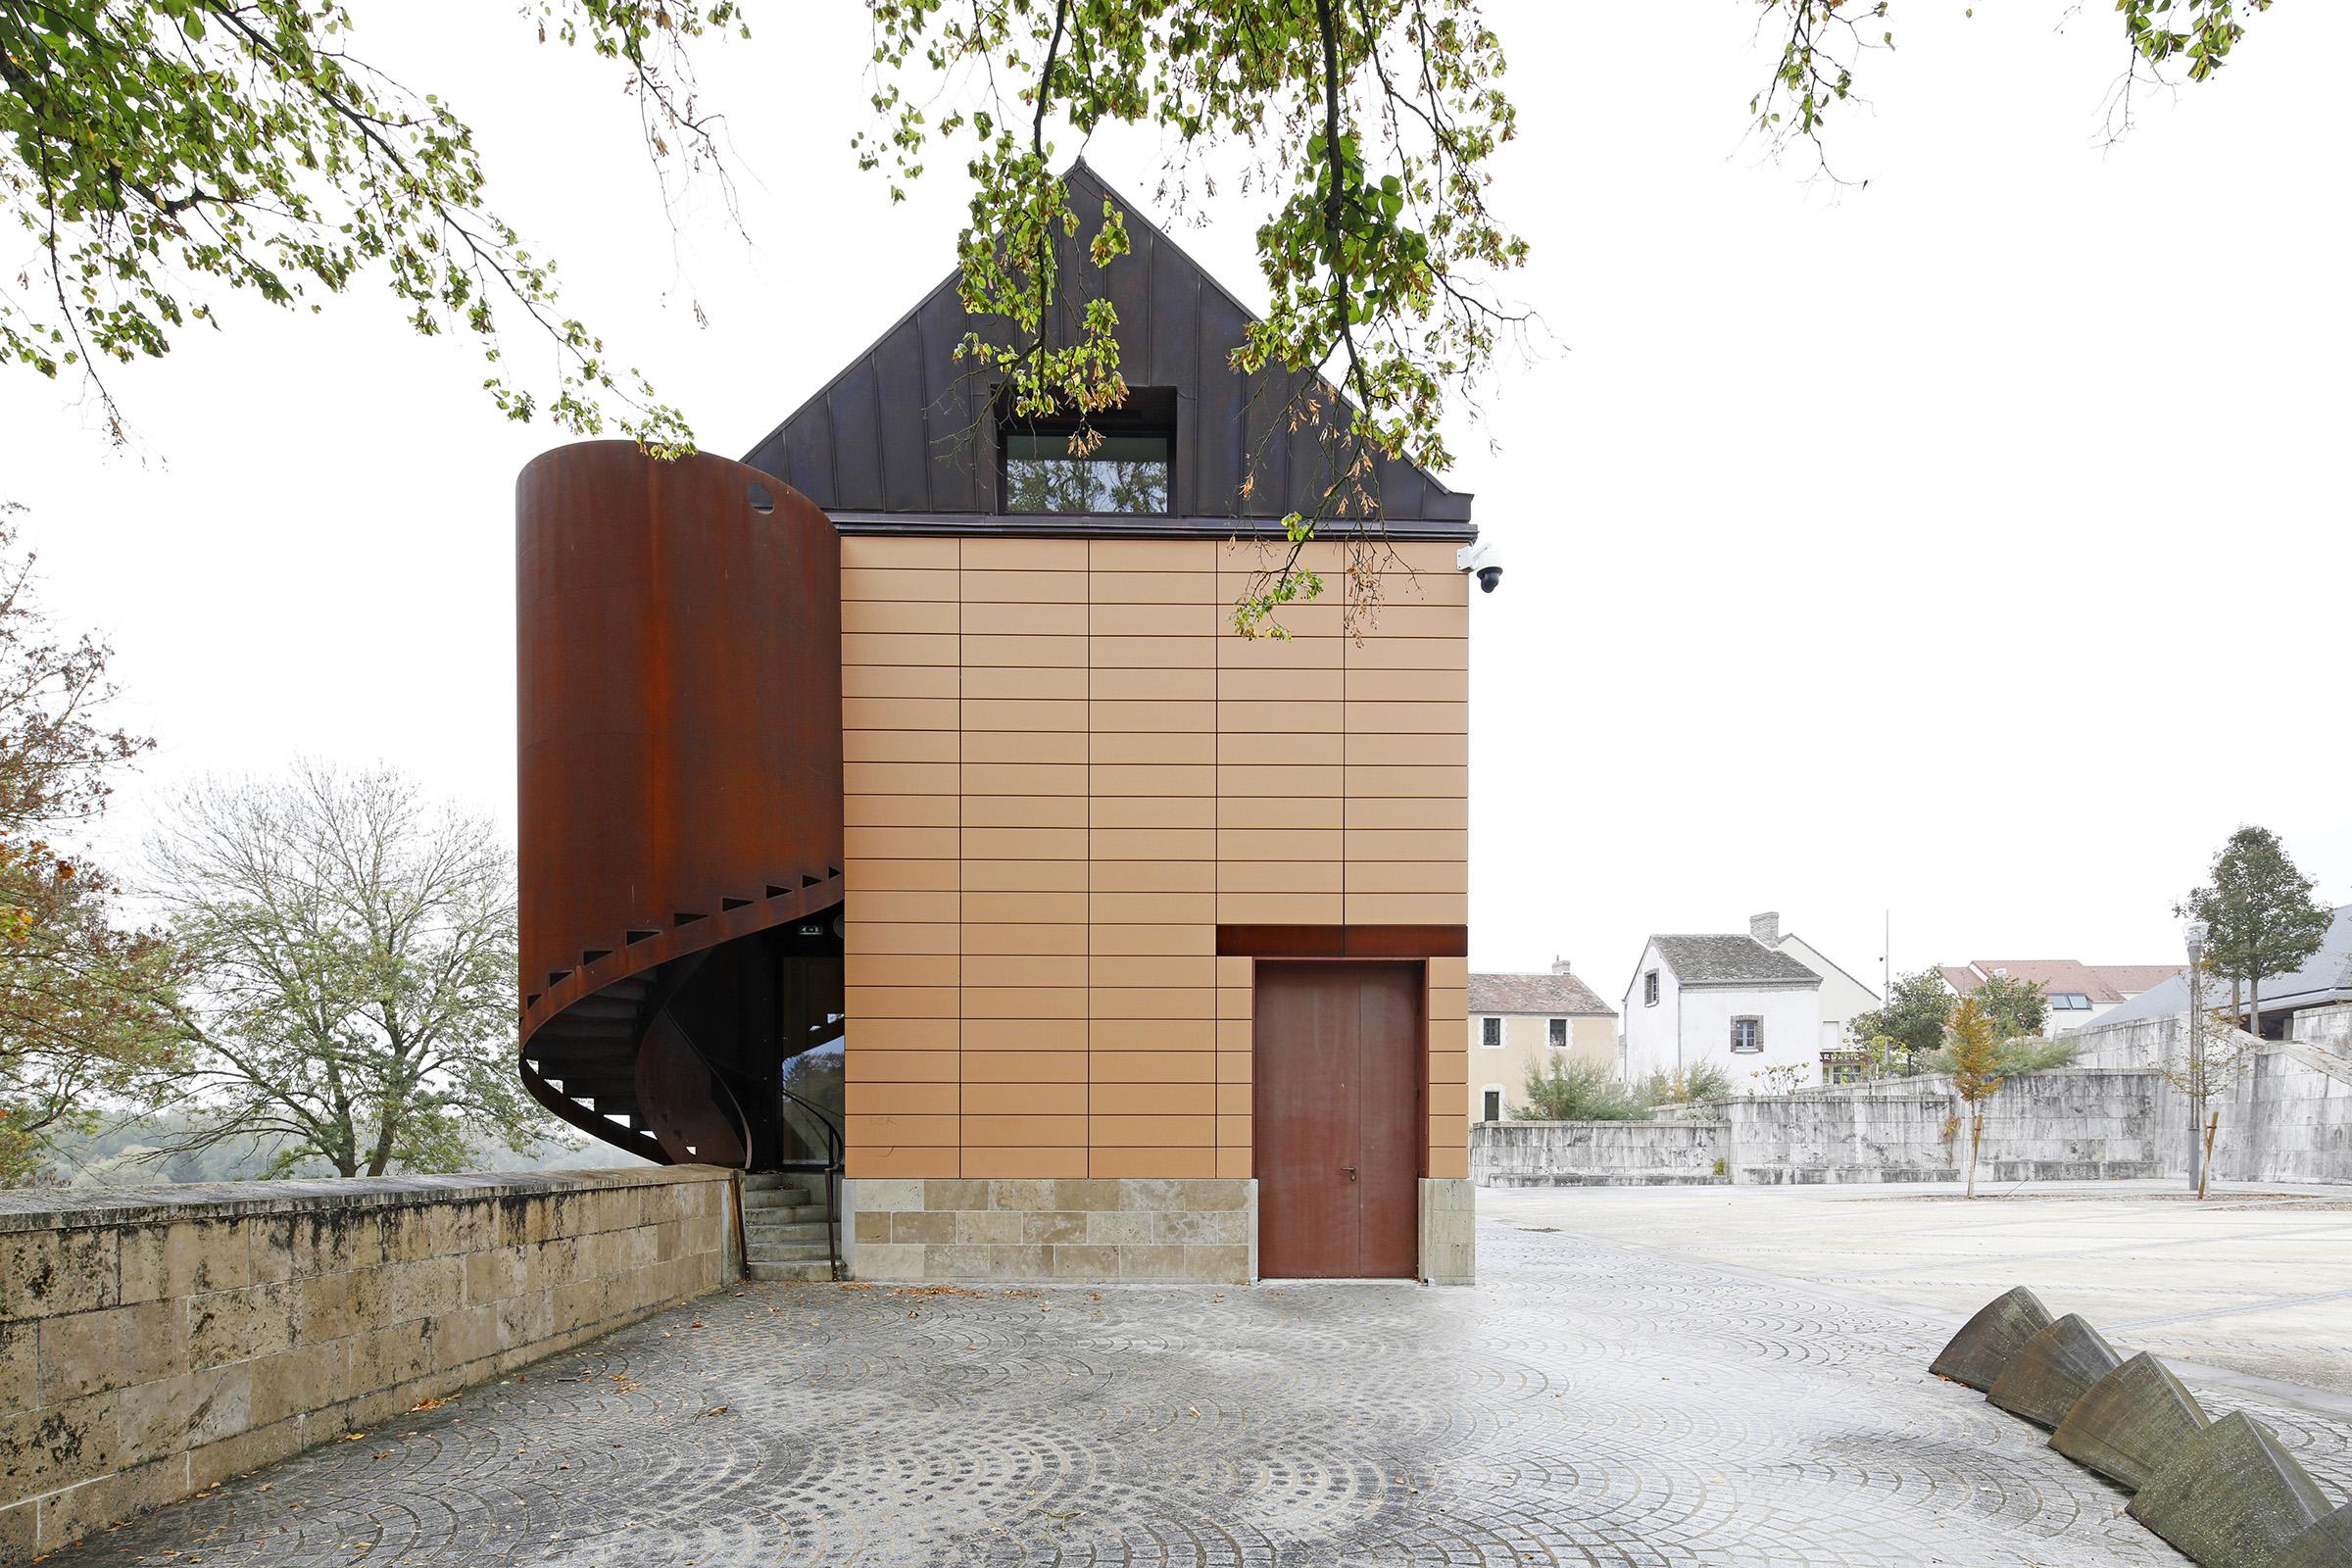 Amilly - La Maison Saint Loup - Sylvain Dubuisson 012.jpg